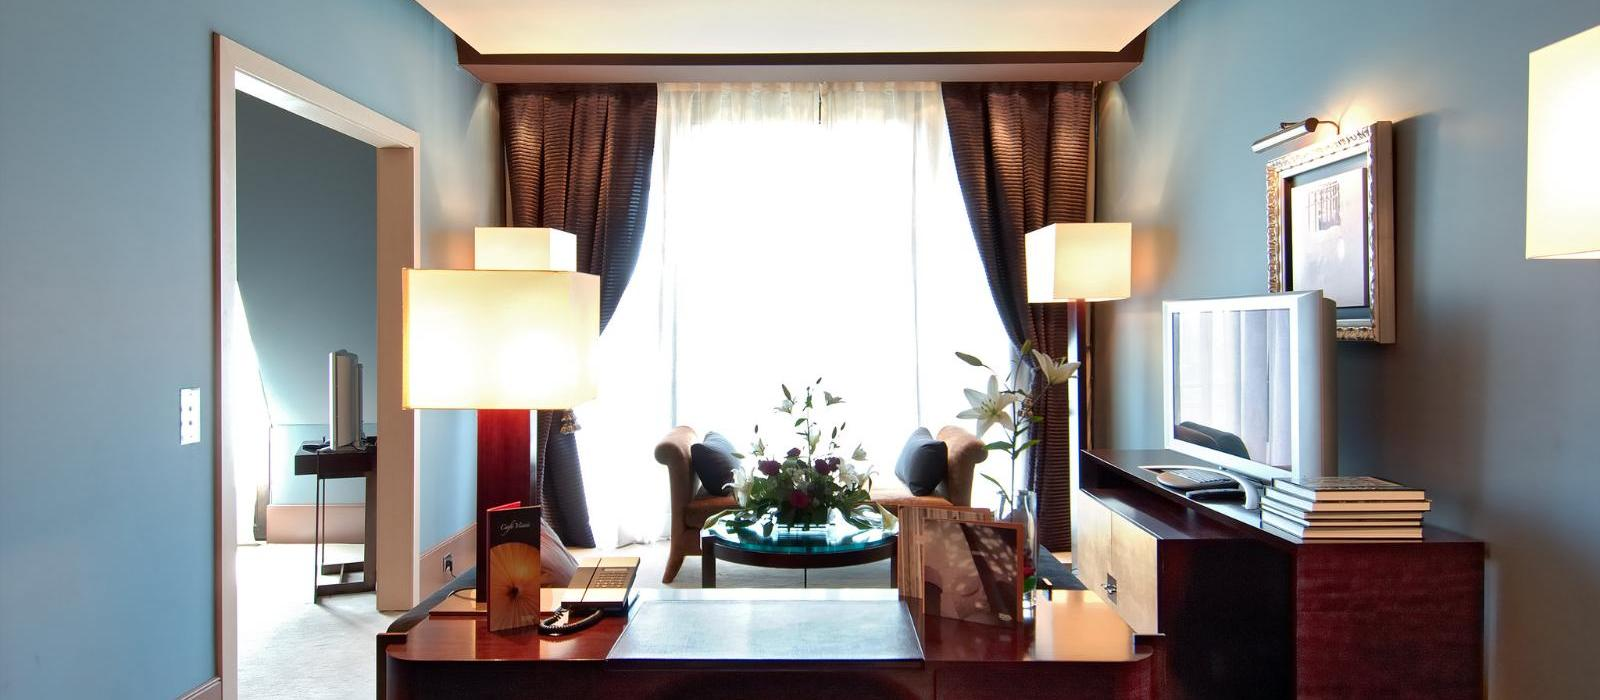 富诗之家酒店(Hotel Casa Fuster) 高级套房图片  www.lhw.cn